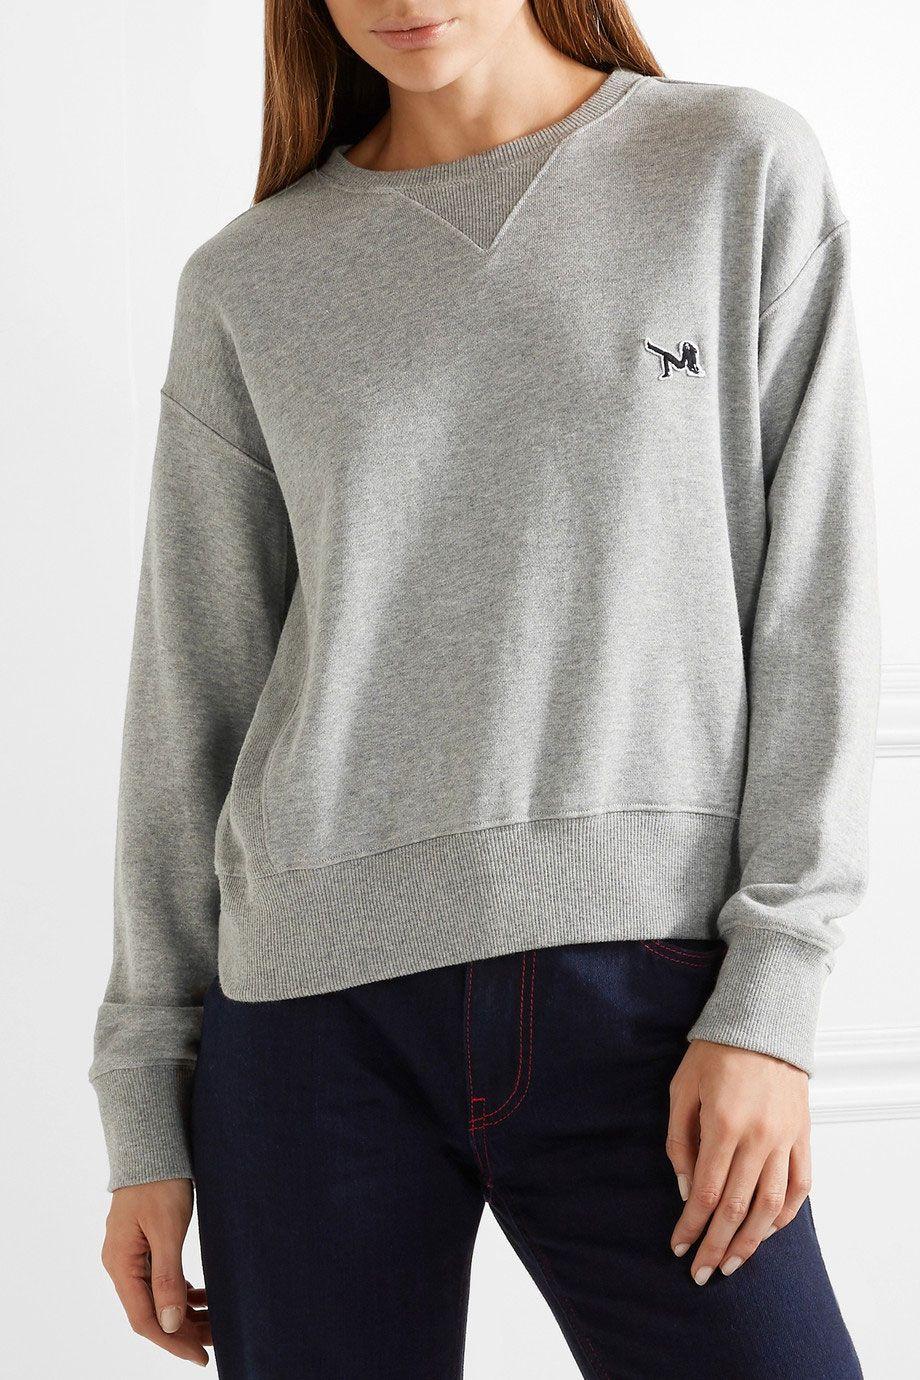 Calvin Klein 205W39NYC Appliquéd Sweatshirt